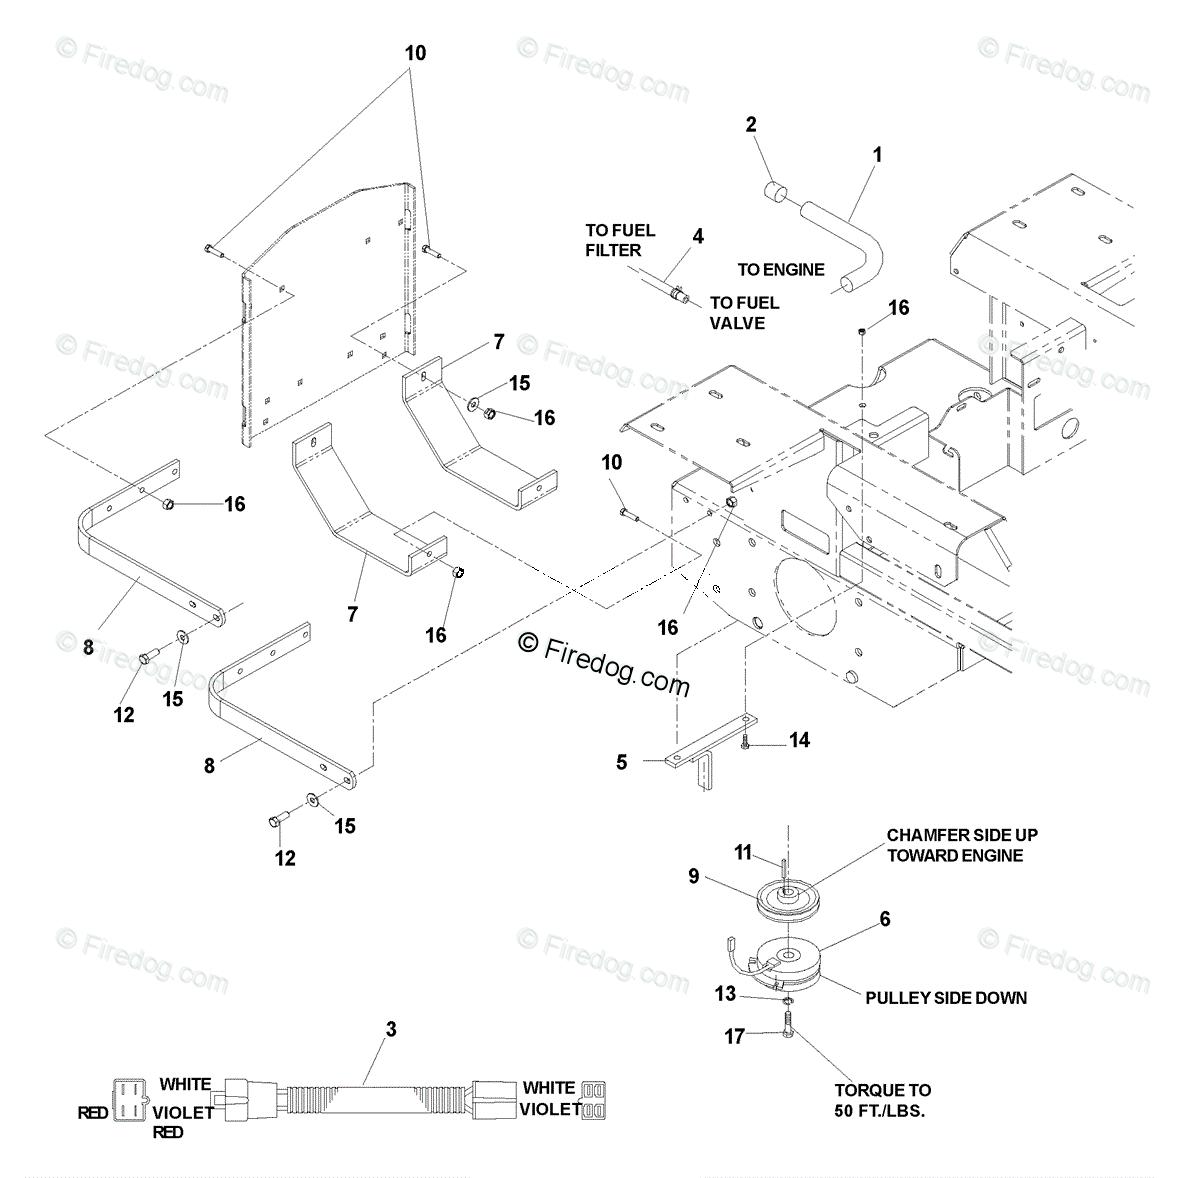 Kohler 23 Hp Engine Parts Diagram